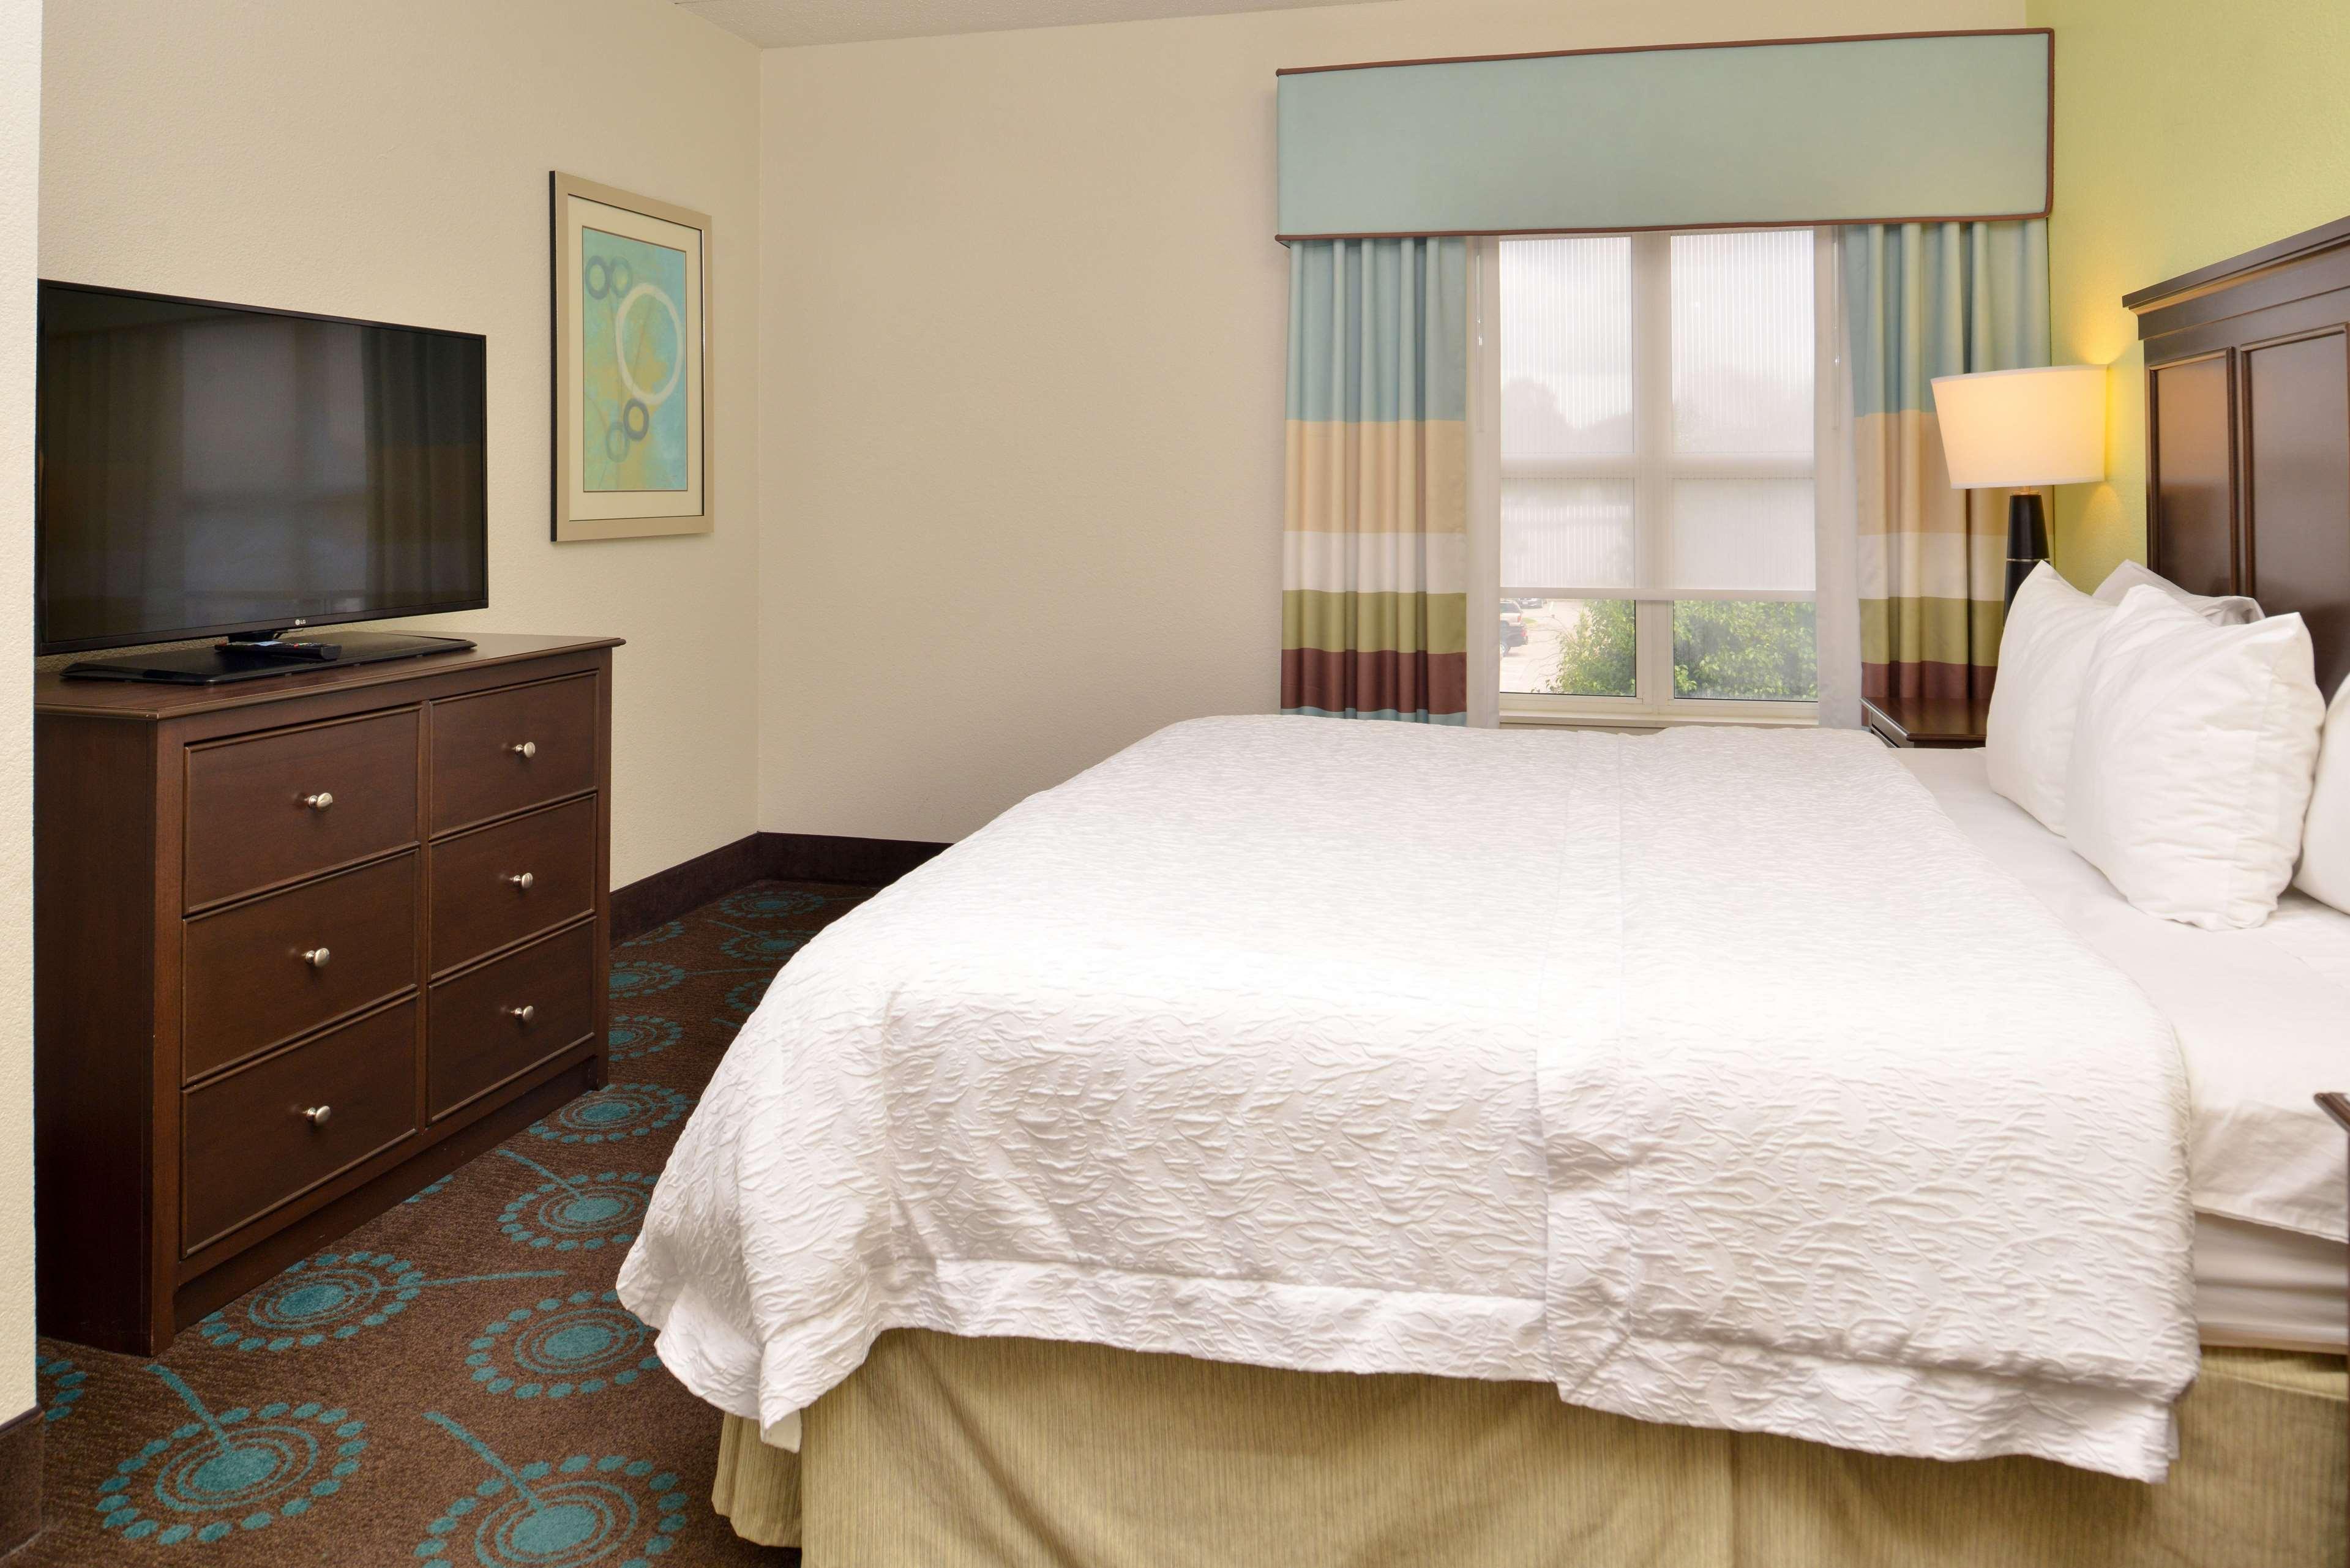 Hampton Inn & Suites Newport News (Oyster Point) image 27